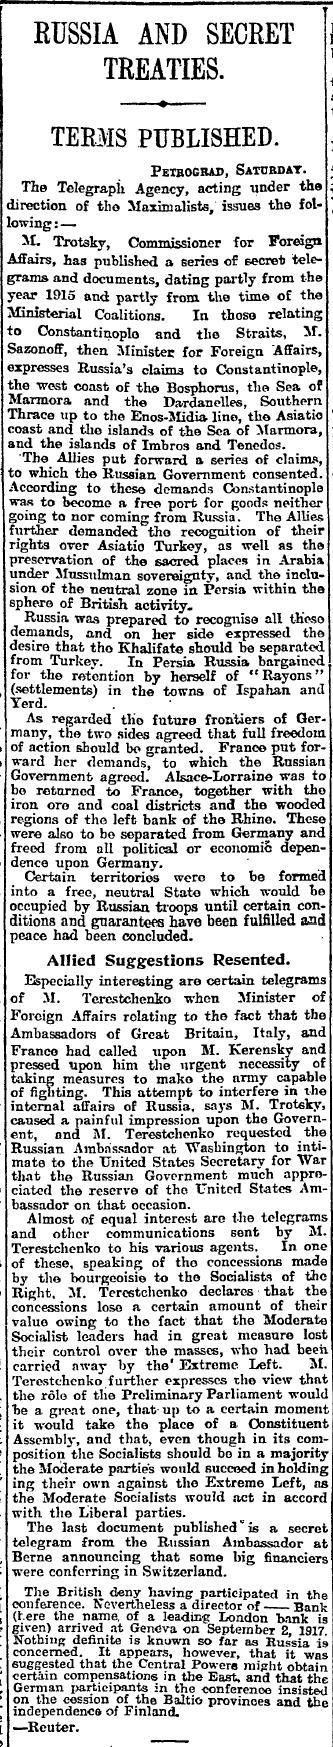 Skyes_Picot,_The_Manchester_Guardian,_Monday,_November_26,_1917,_p5